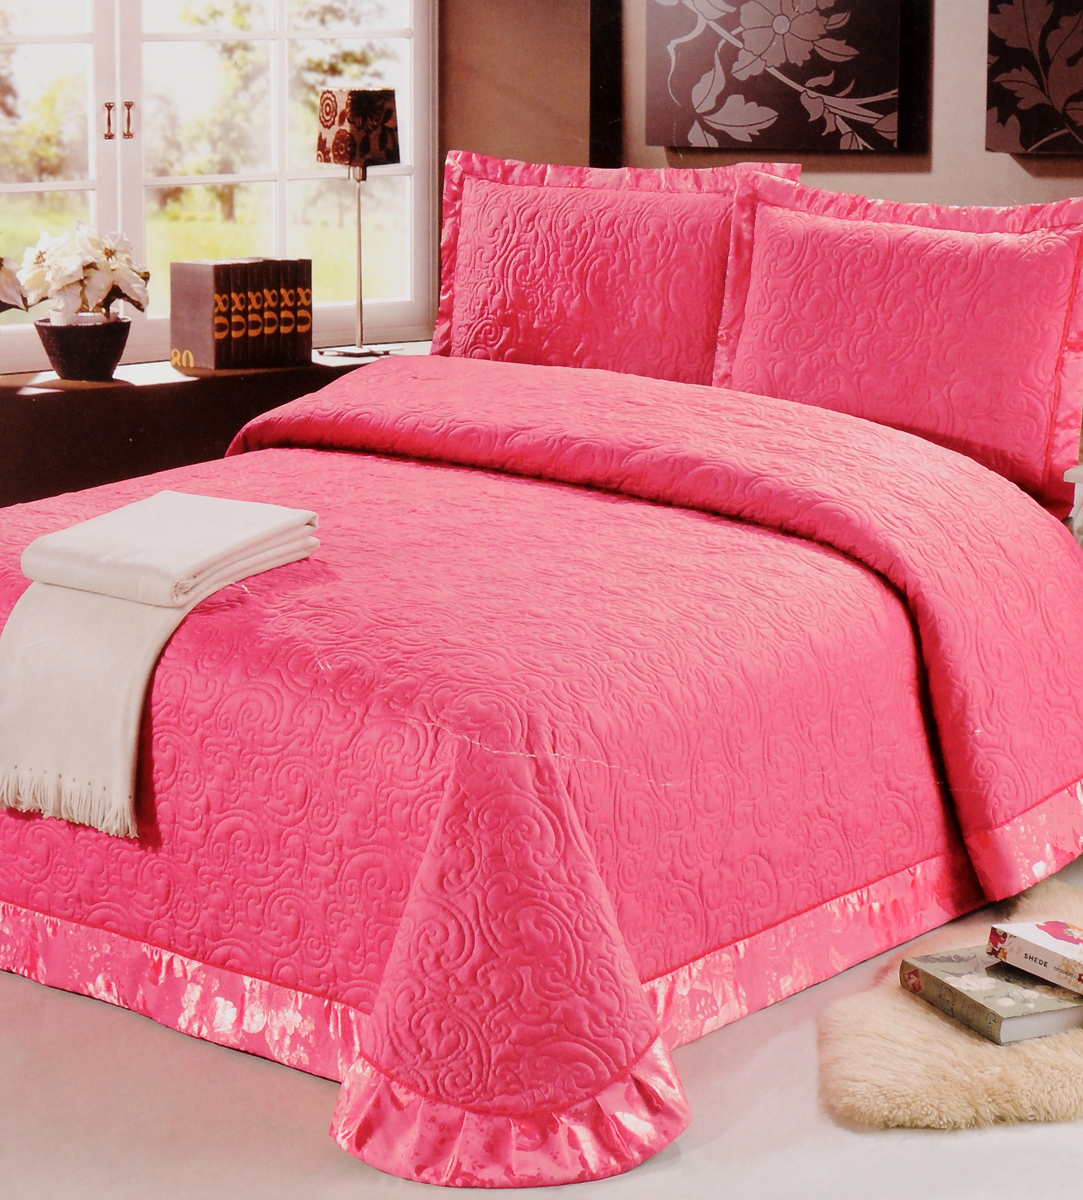 Комплект для спальни Cleo Сатин: покрывало 240 х 260 см, 2 наволочки 50 х 70 см, цвет: фуксия комплект для спальни cleo мишлей покрывало 230 х 250 см 2 наволочки 50 х 70 см